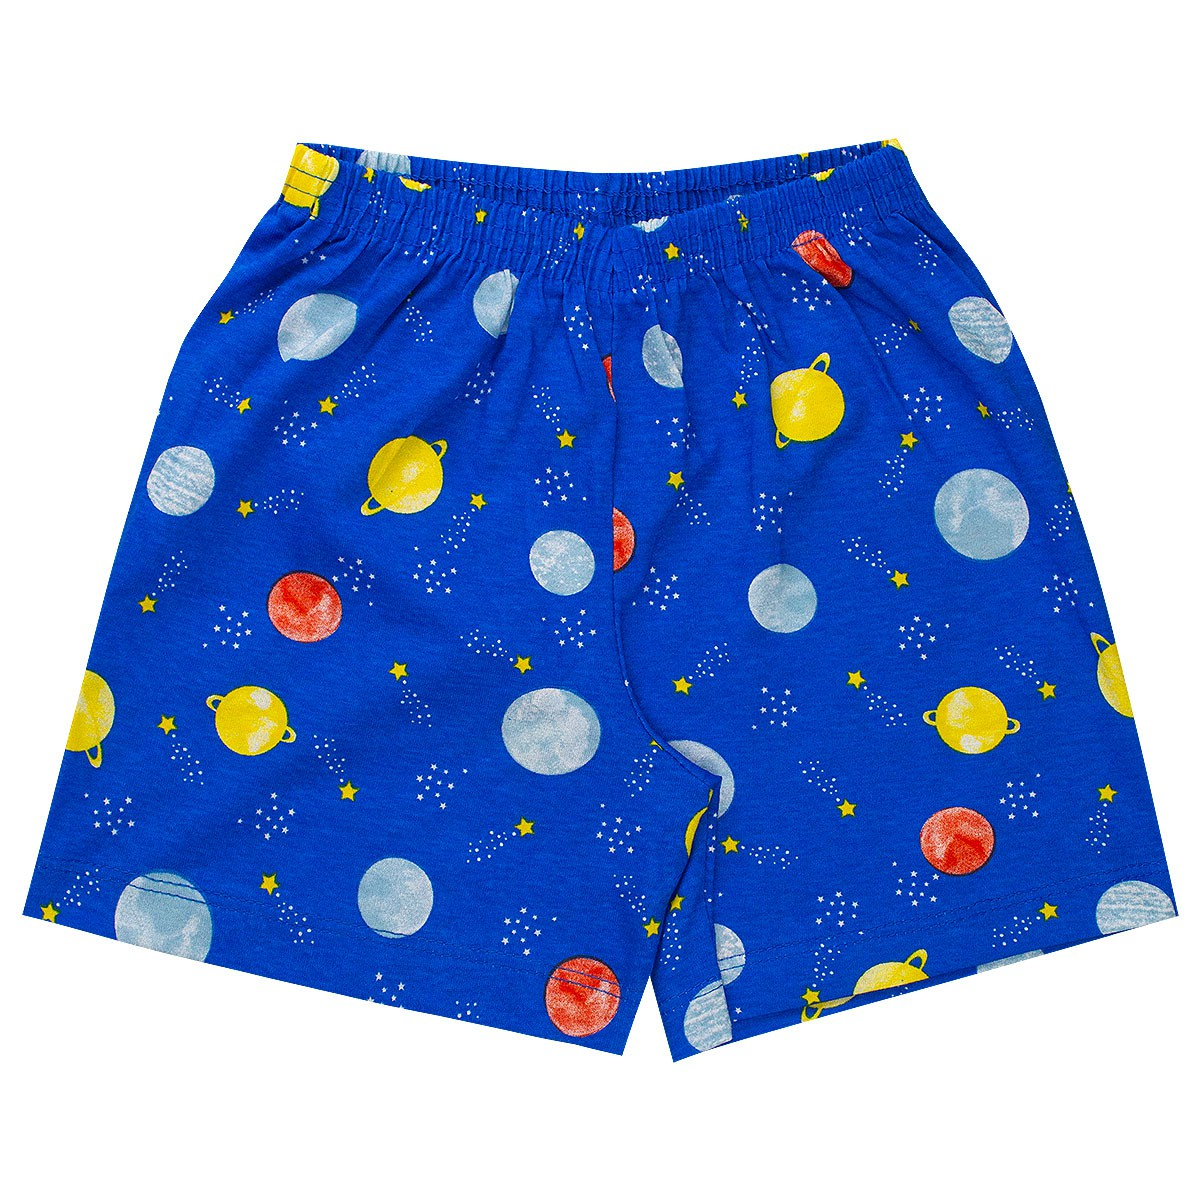 Conjunto Pijama Infantil Menino Brilha No Escuro Regata Branco